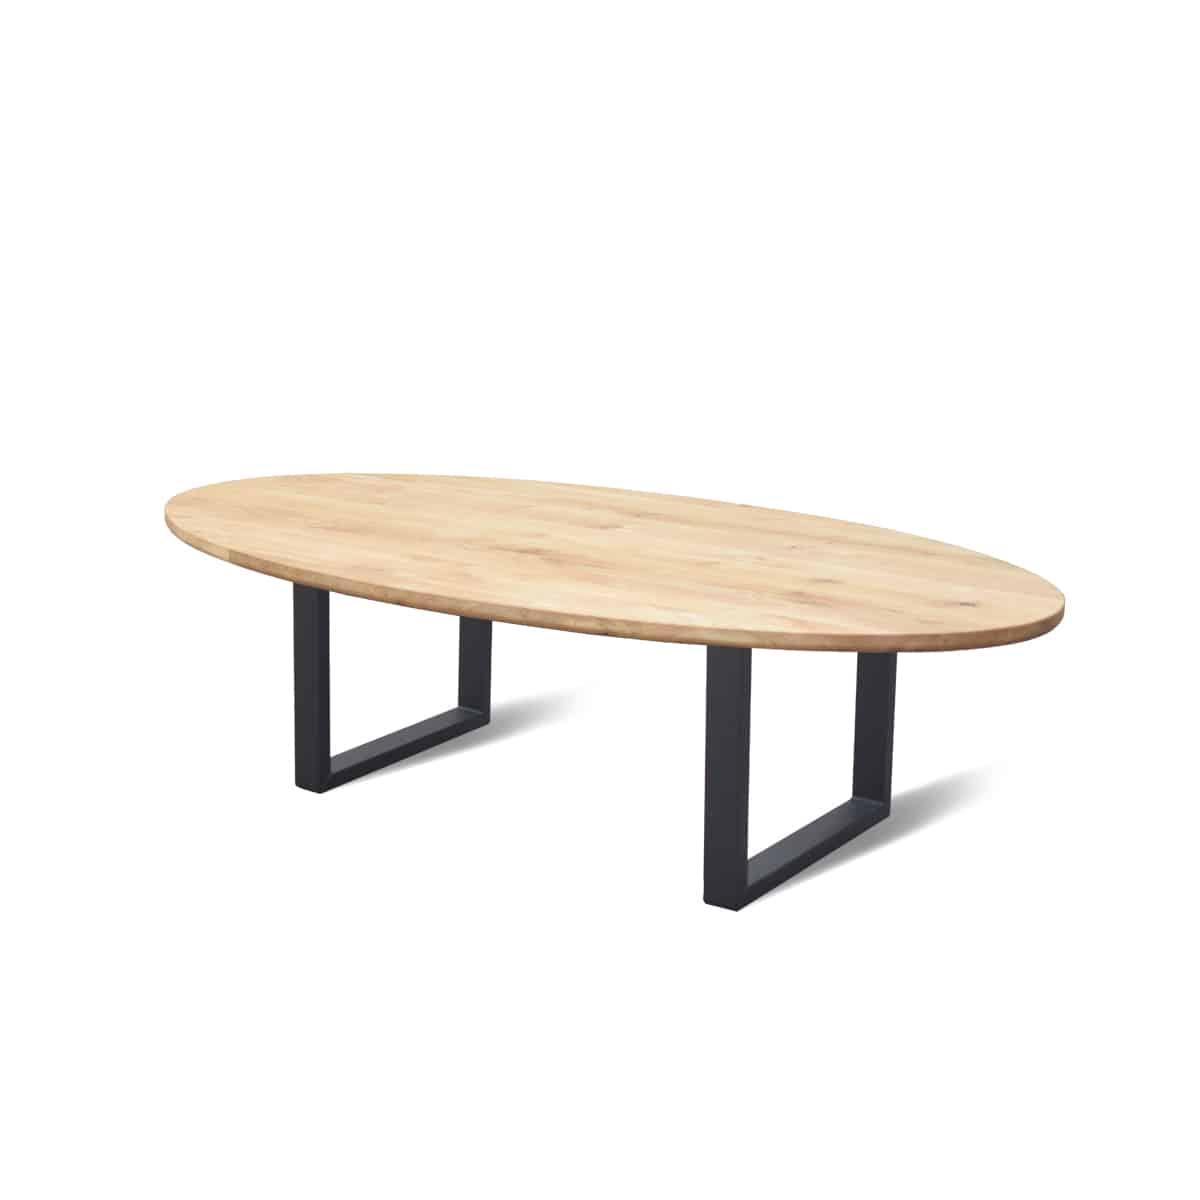 Ovale industriële eetkamer keuken tafel eiken staal